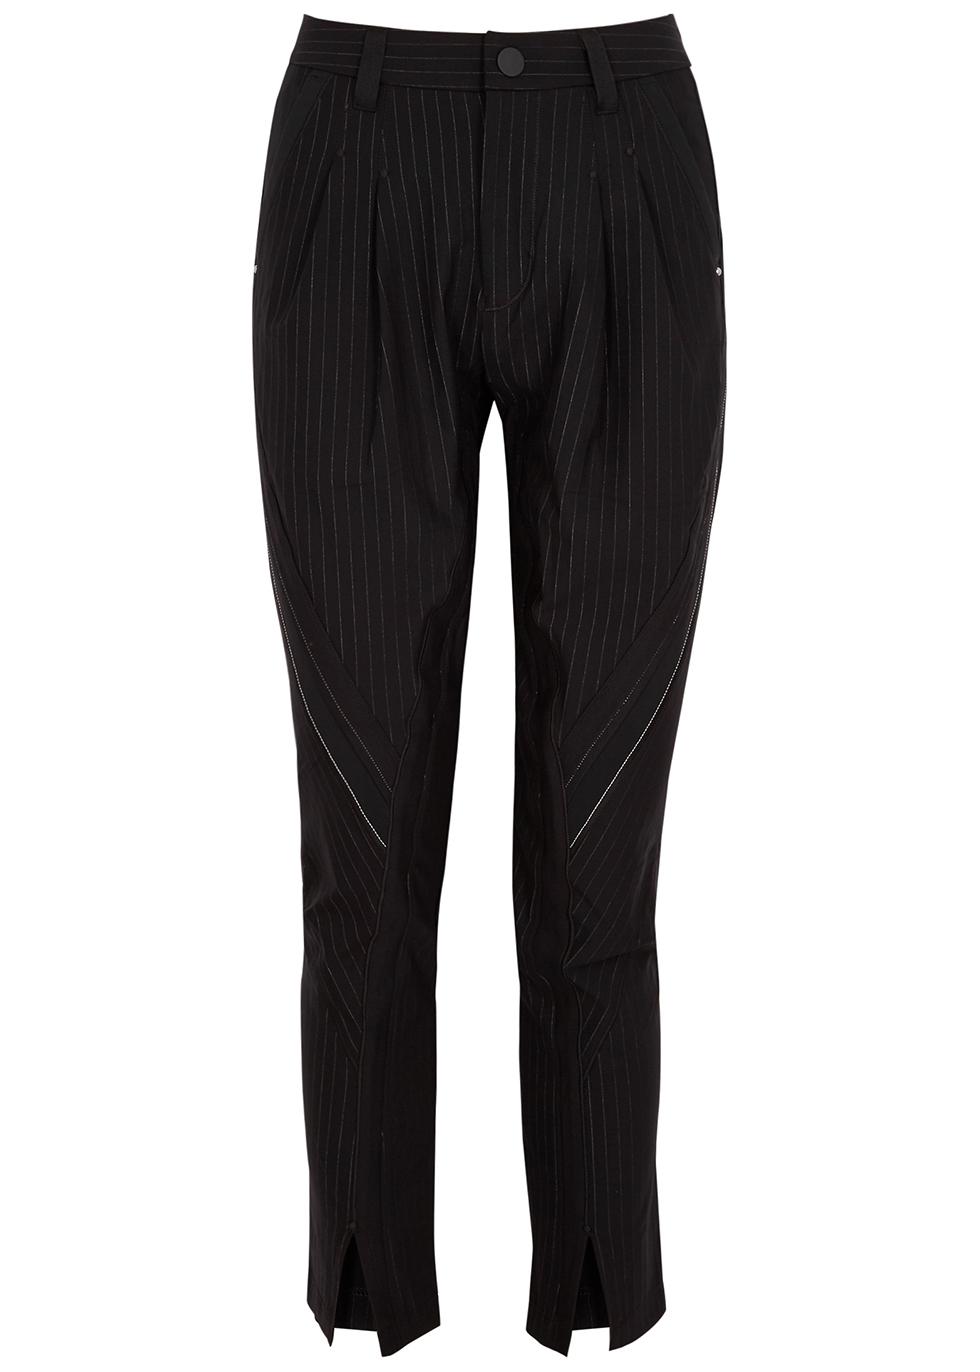 Swerve black slim-leg trousers